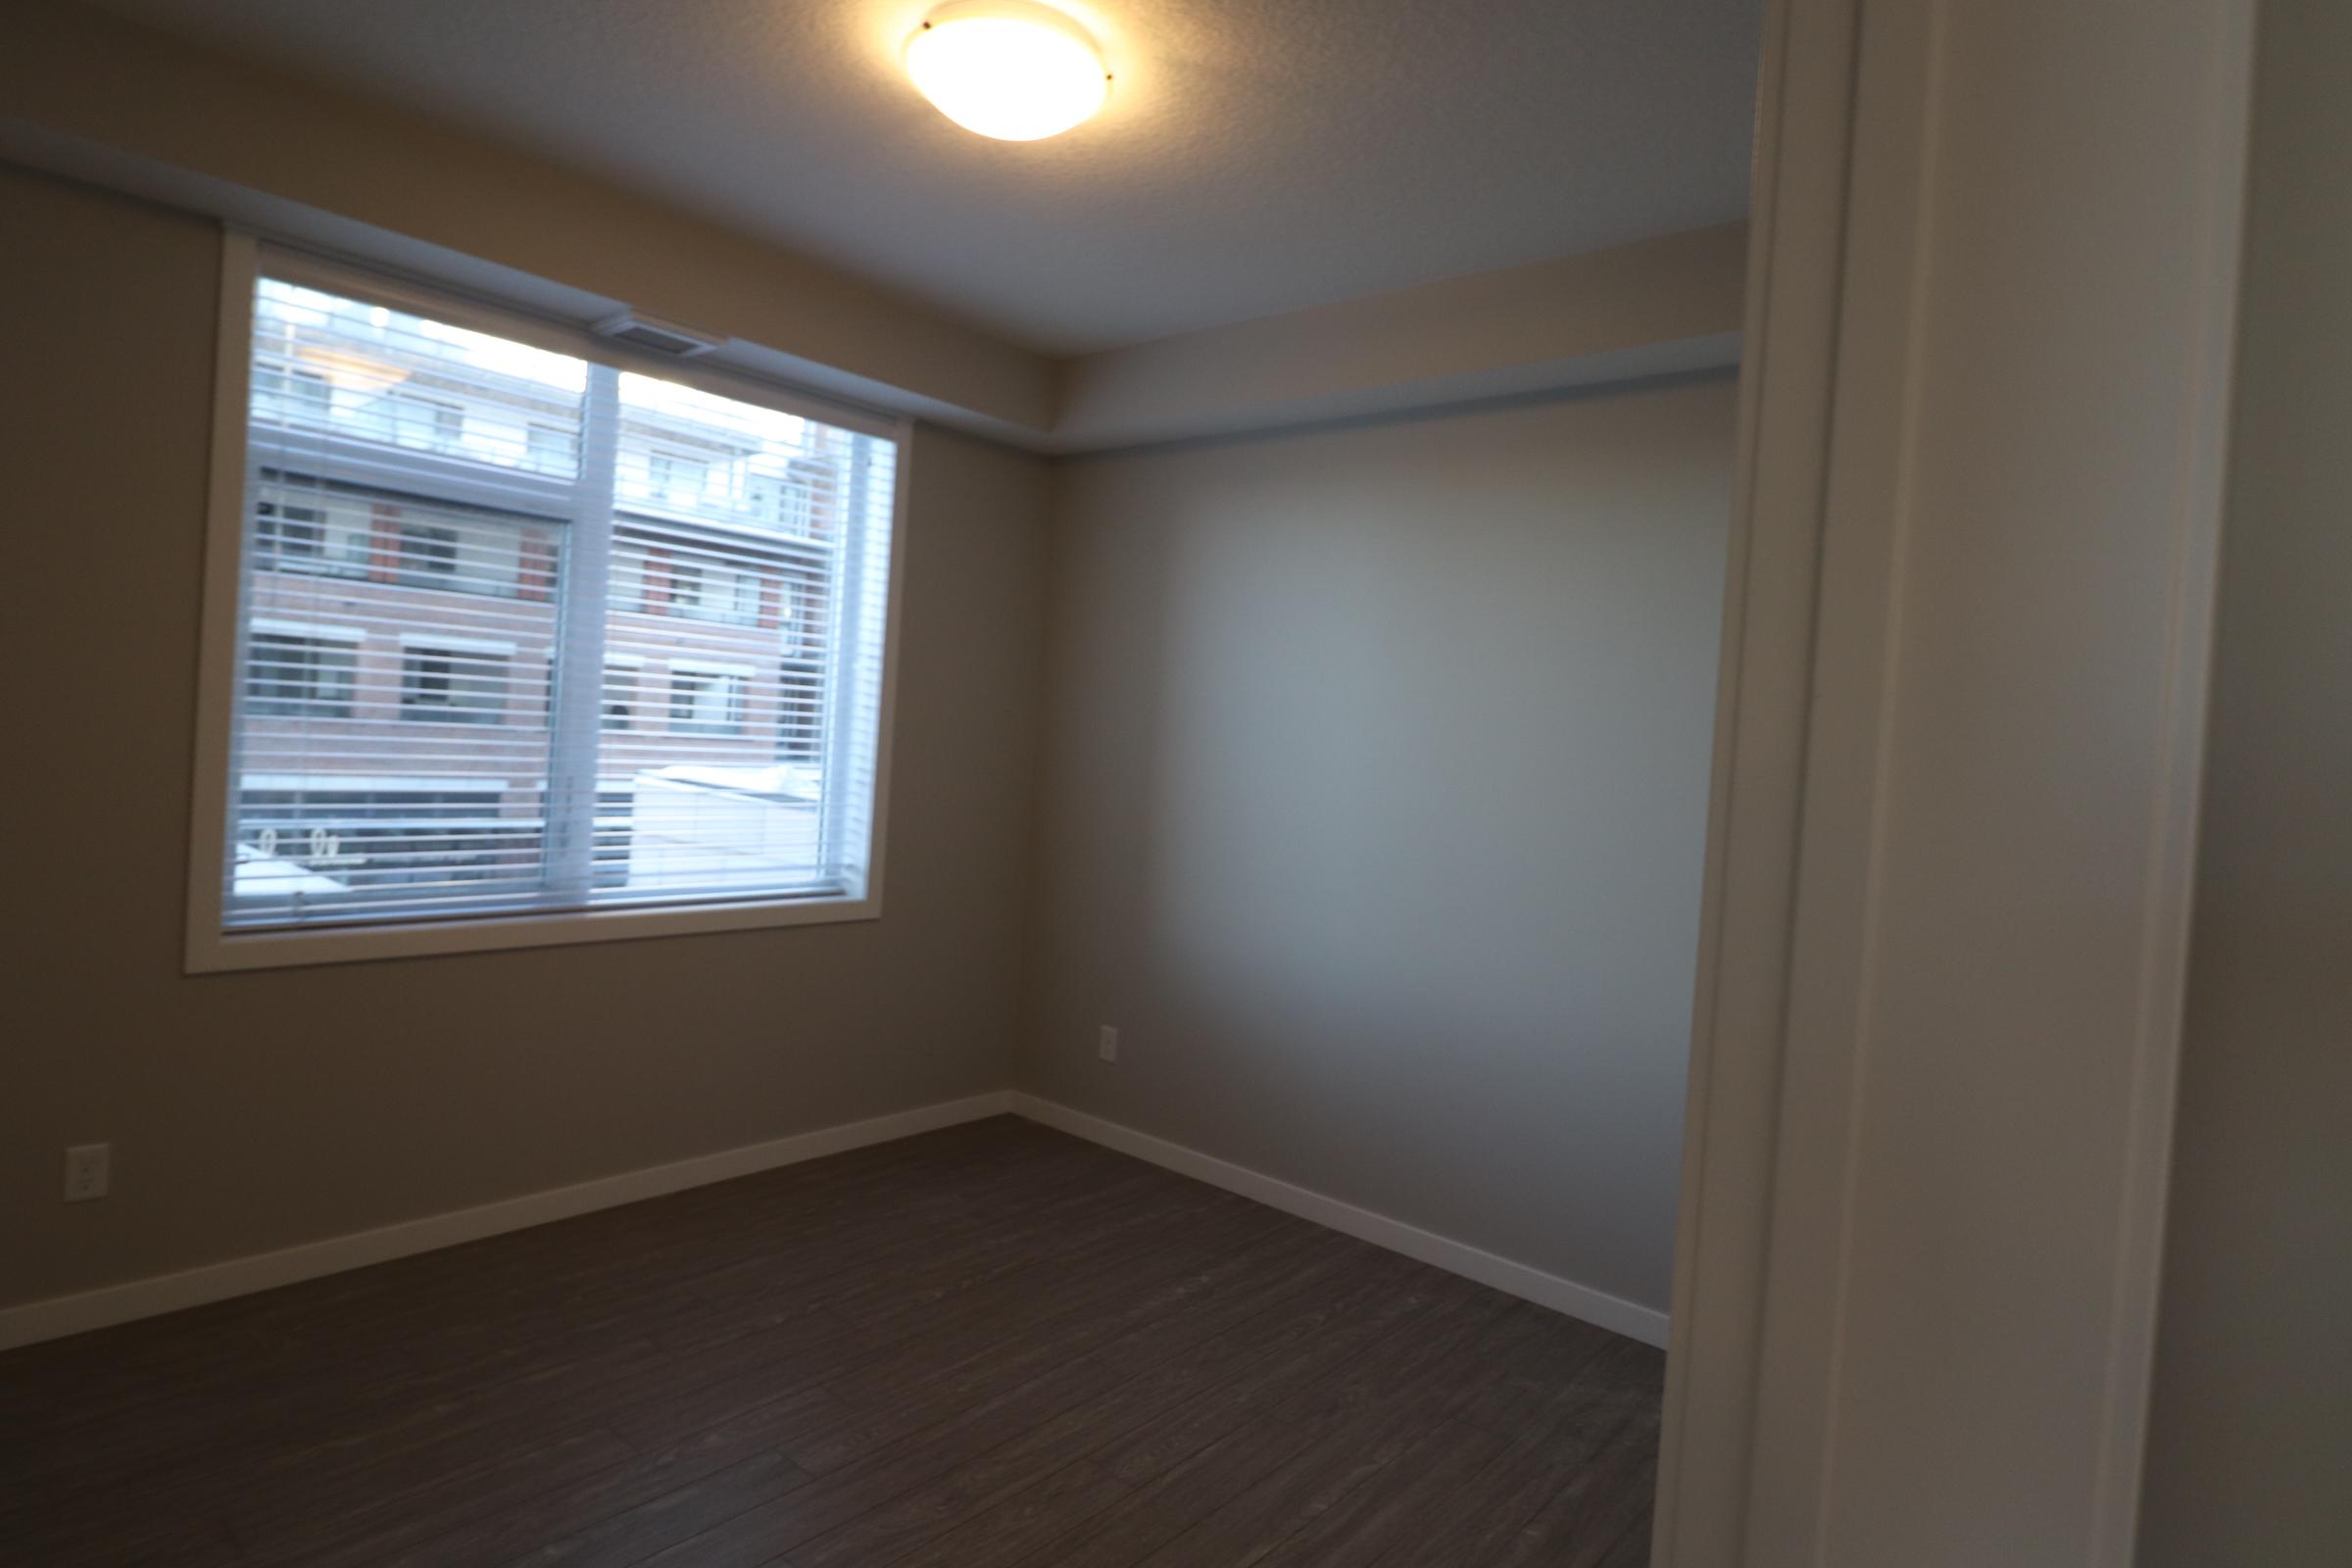 121 Mahogany Center SE, Calgary, Alberta T3M 3A4, 2 Bedrooms Bedrooms, ,2 BathroomsBathrooms,Condo,For Rent,Lyric,Mahogany Center SE,201,1051